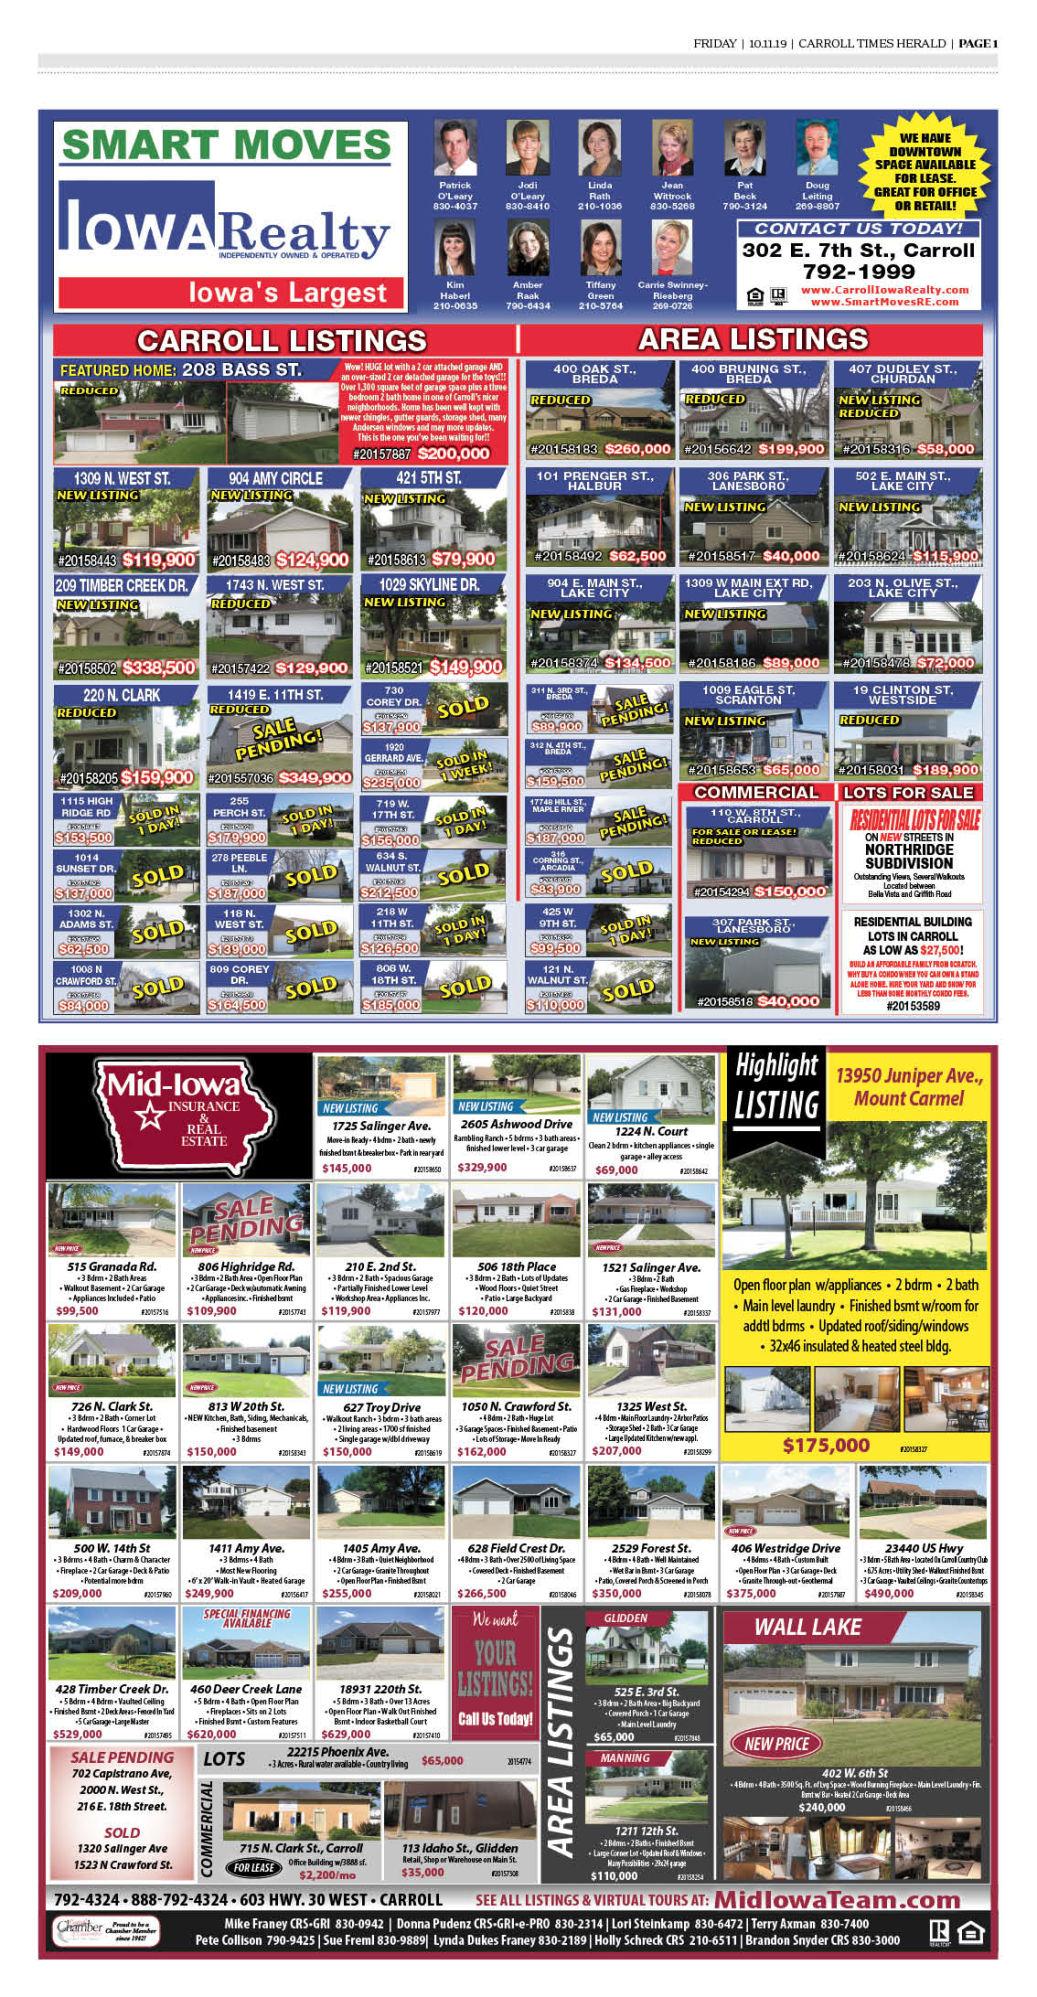 10-11-19 Real Estate 1.jpg